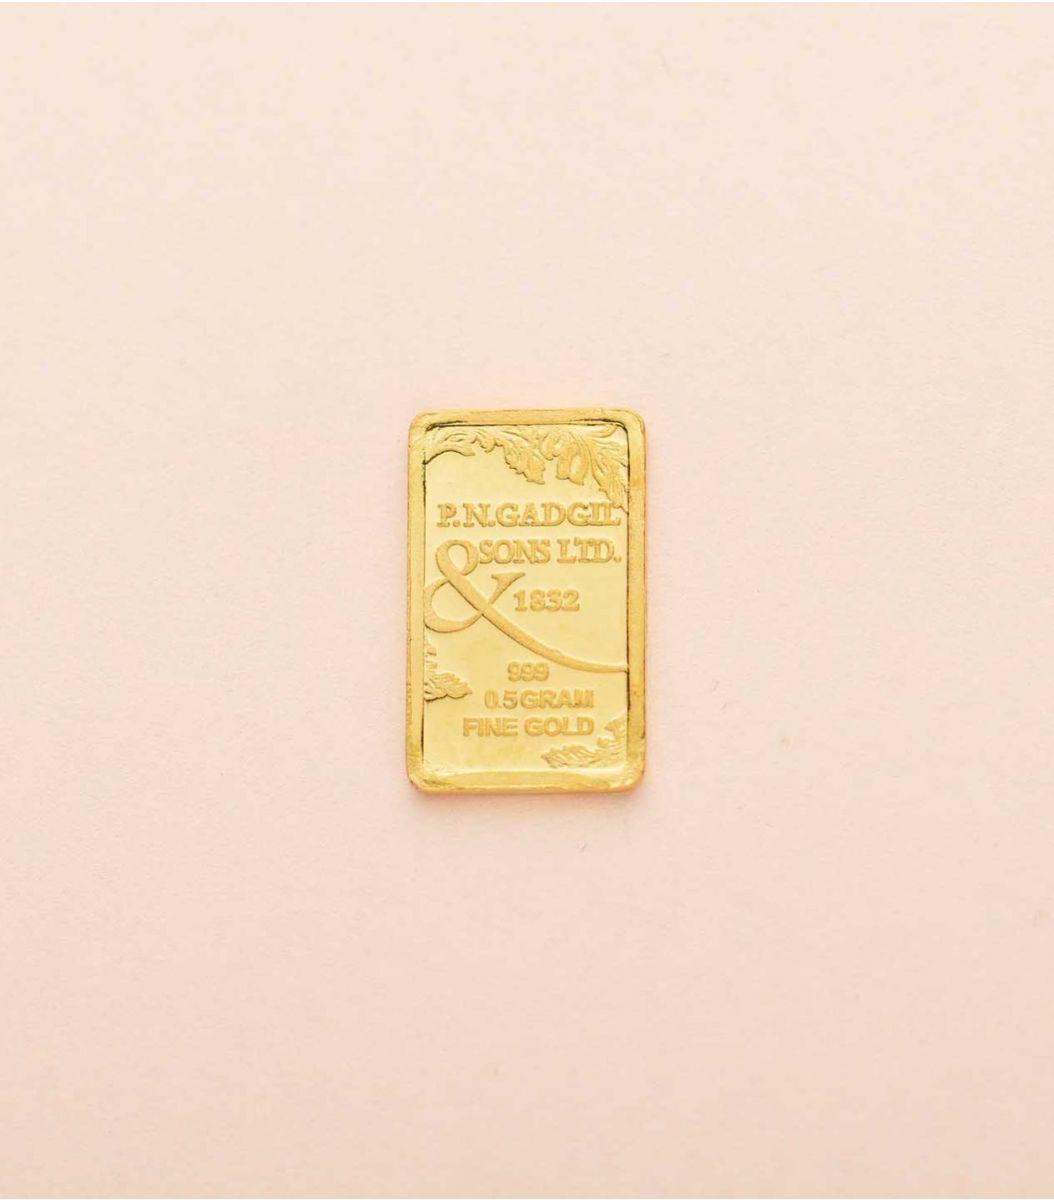 Gold Chip-0.5GM